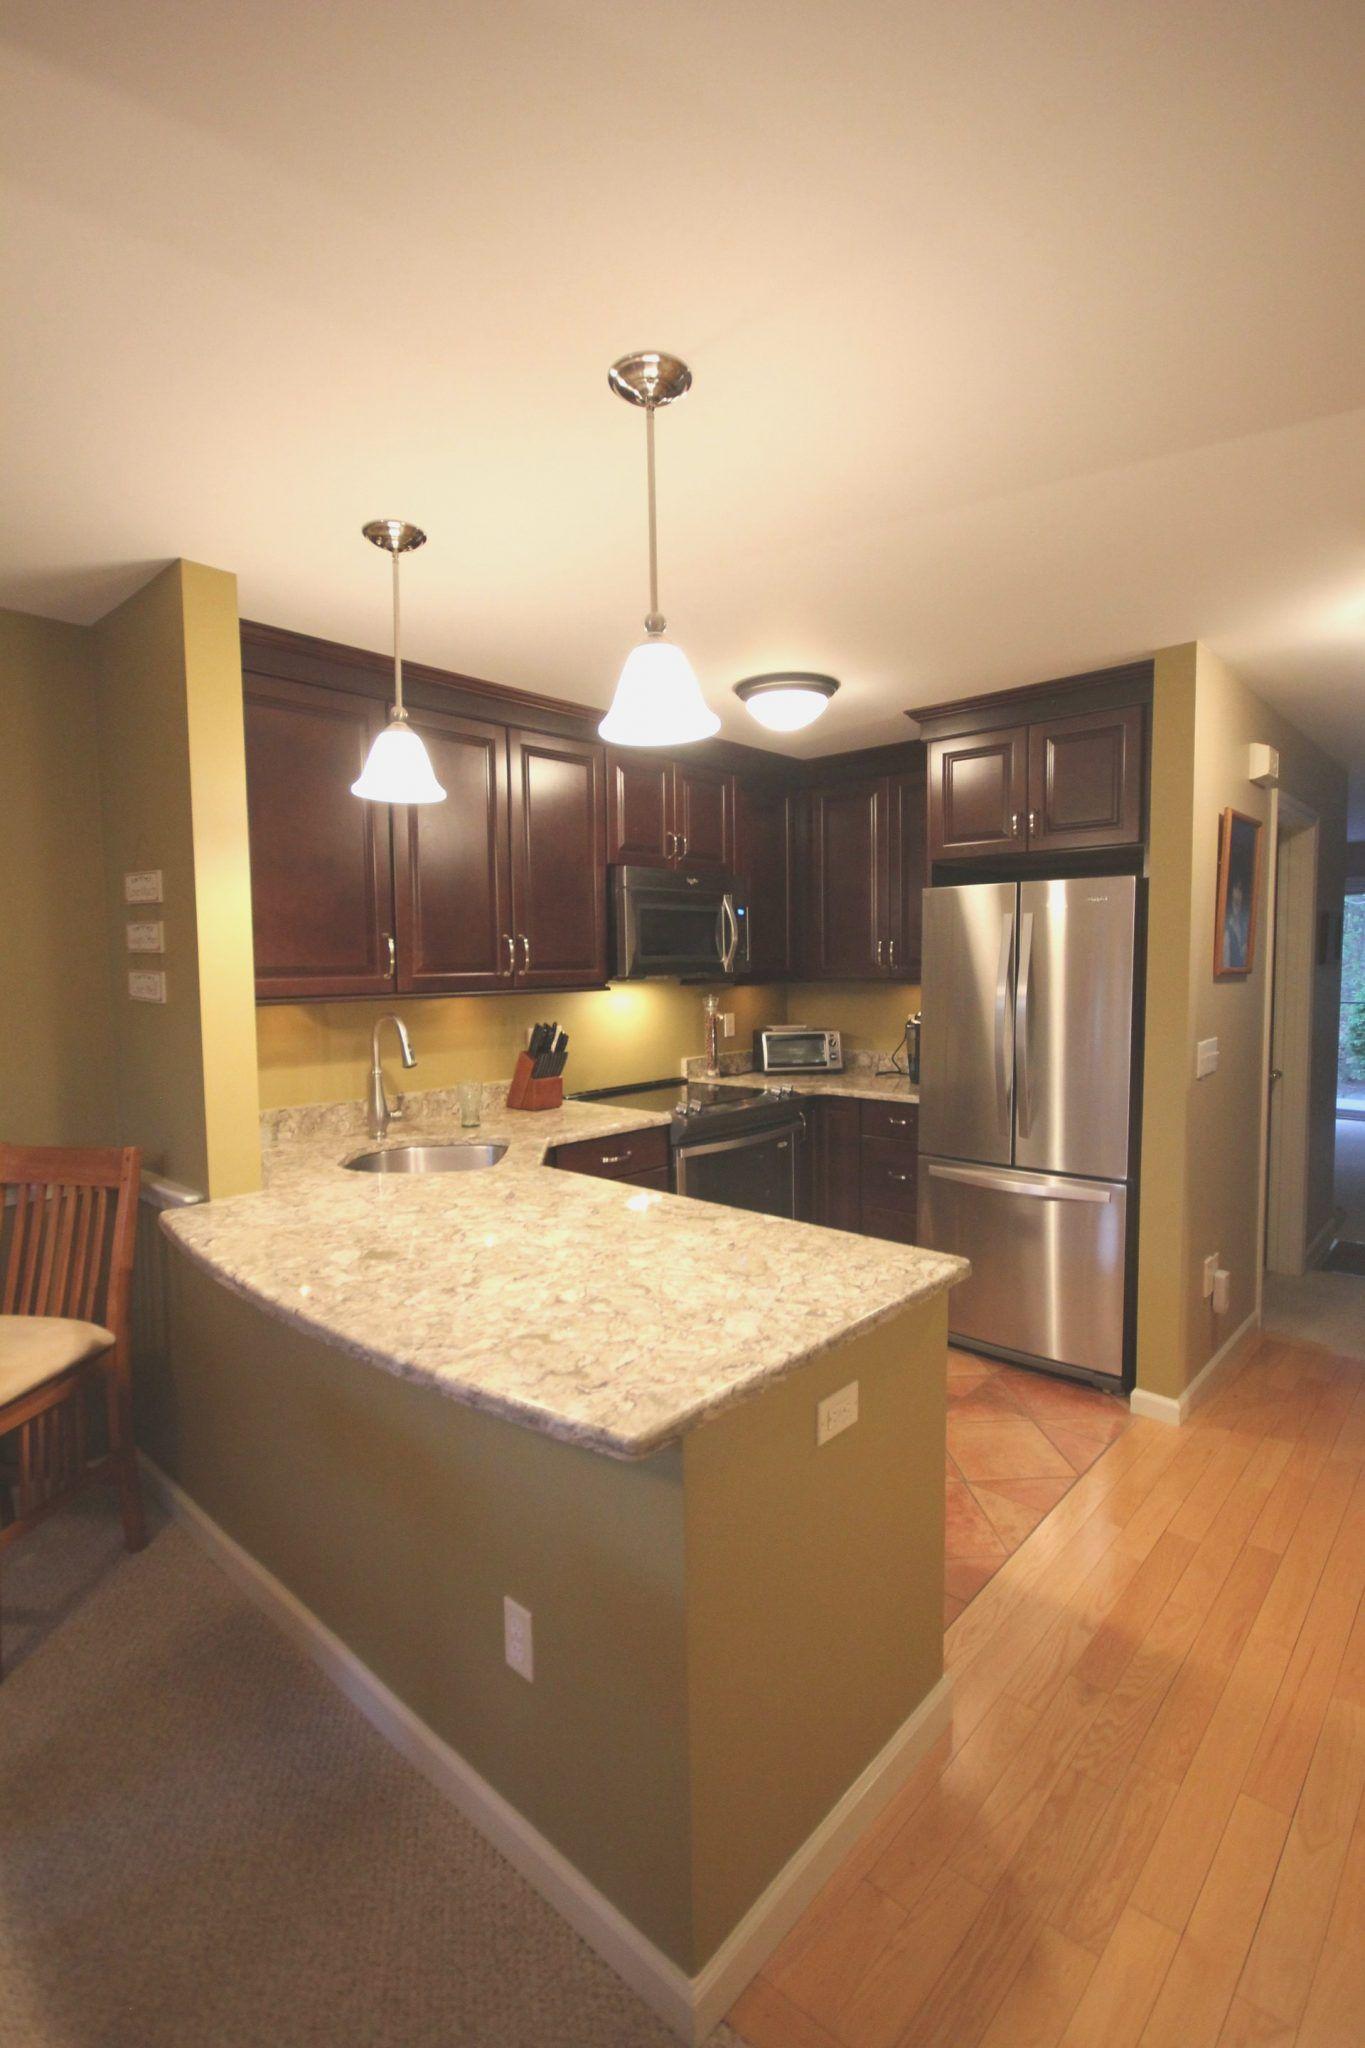 Rhode island Kitchen and Bath - cumberland kitchen and bath ...